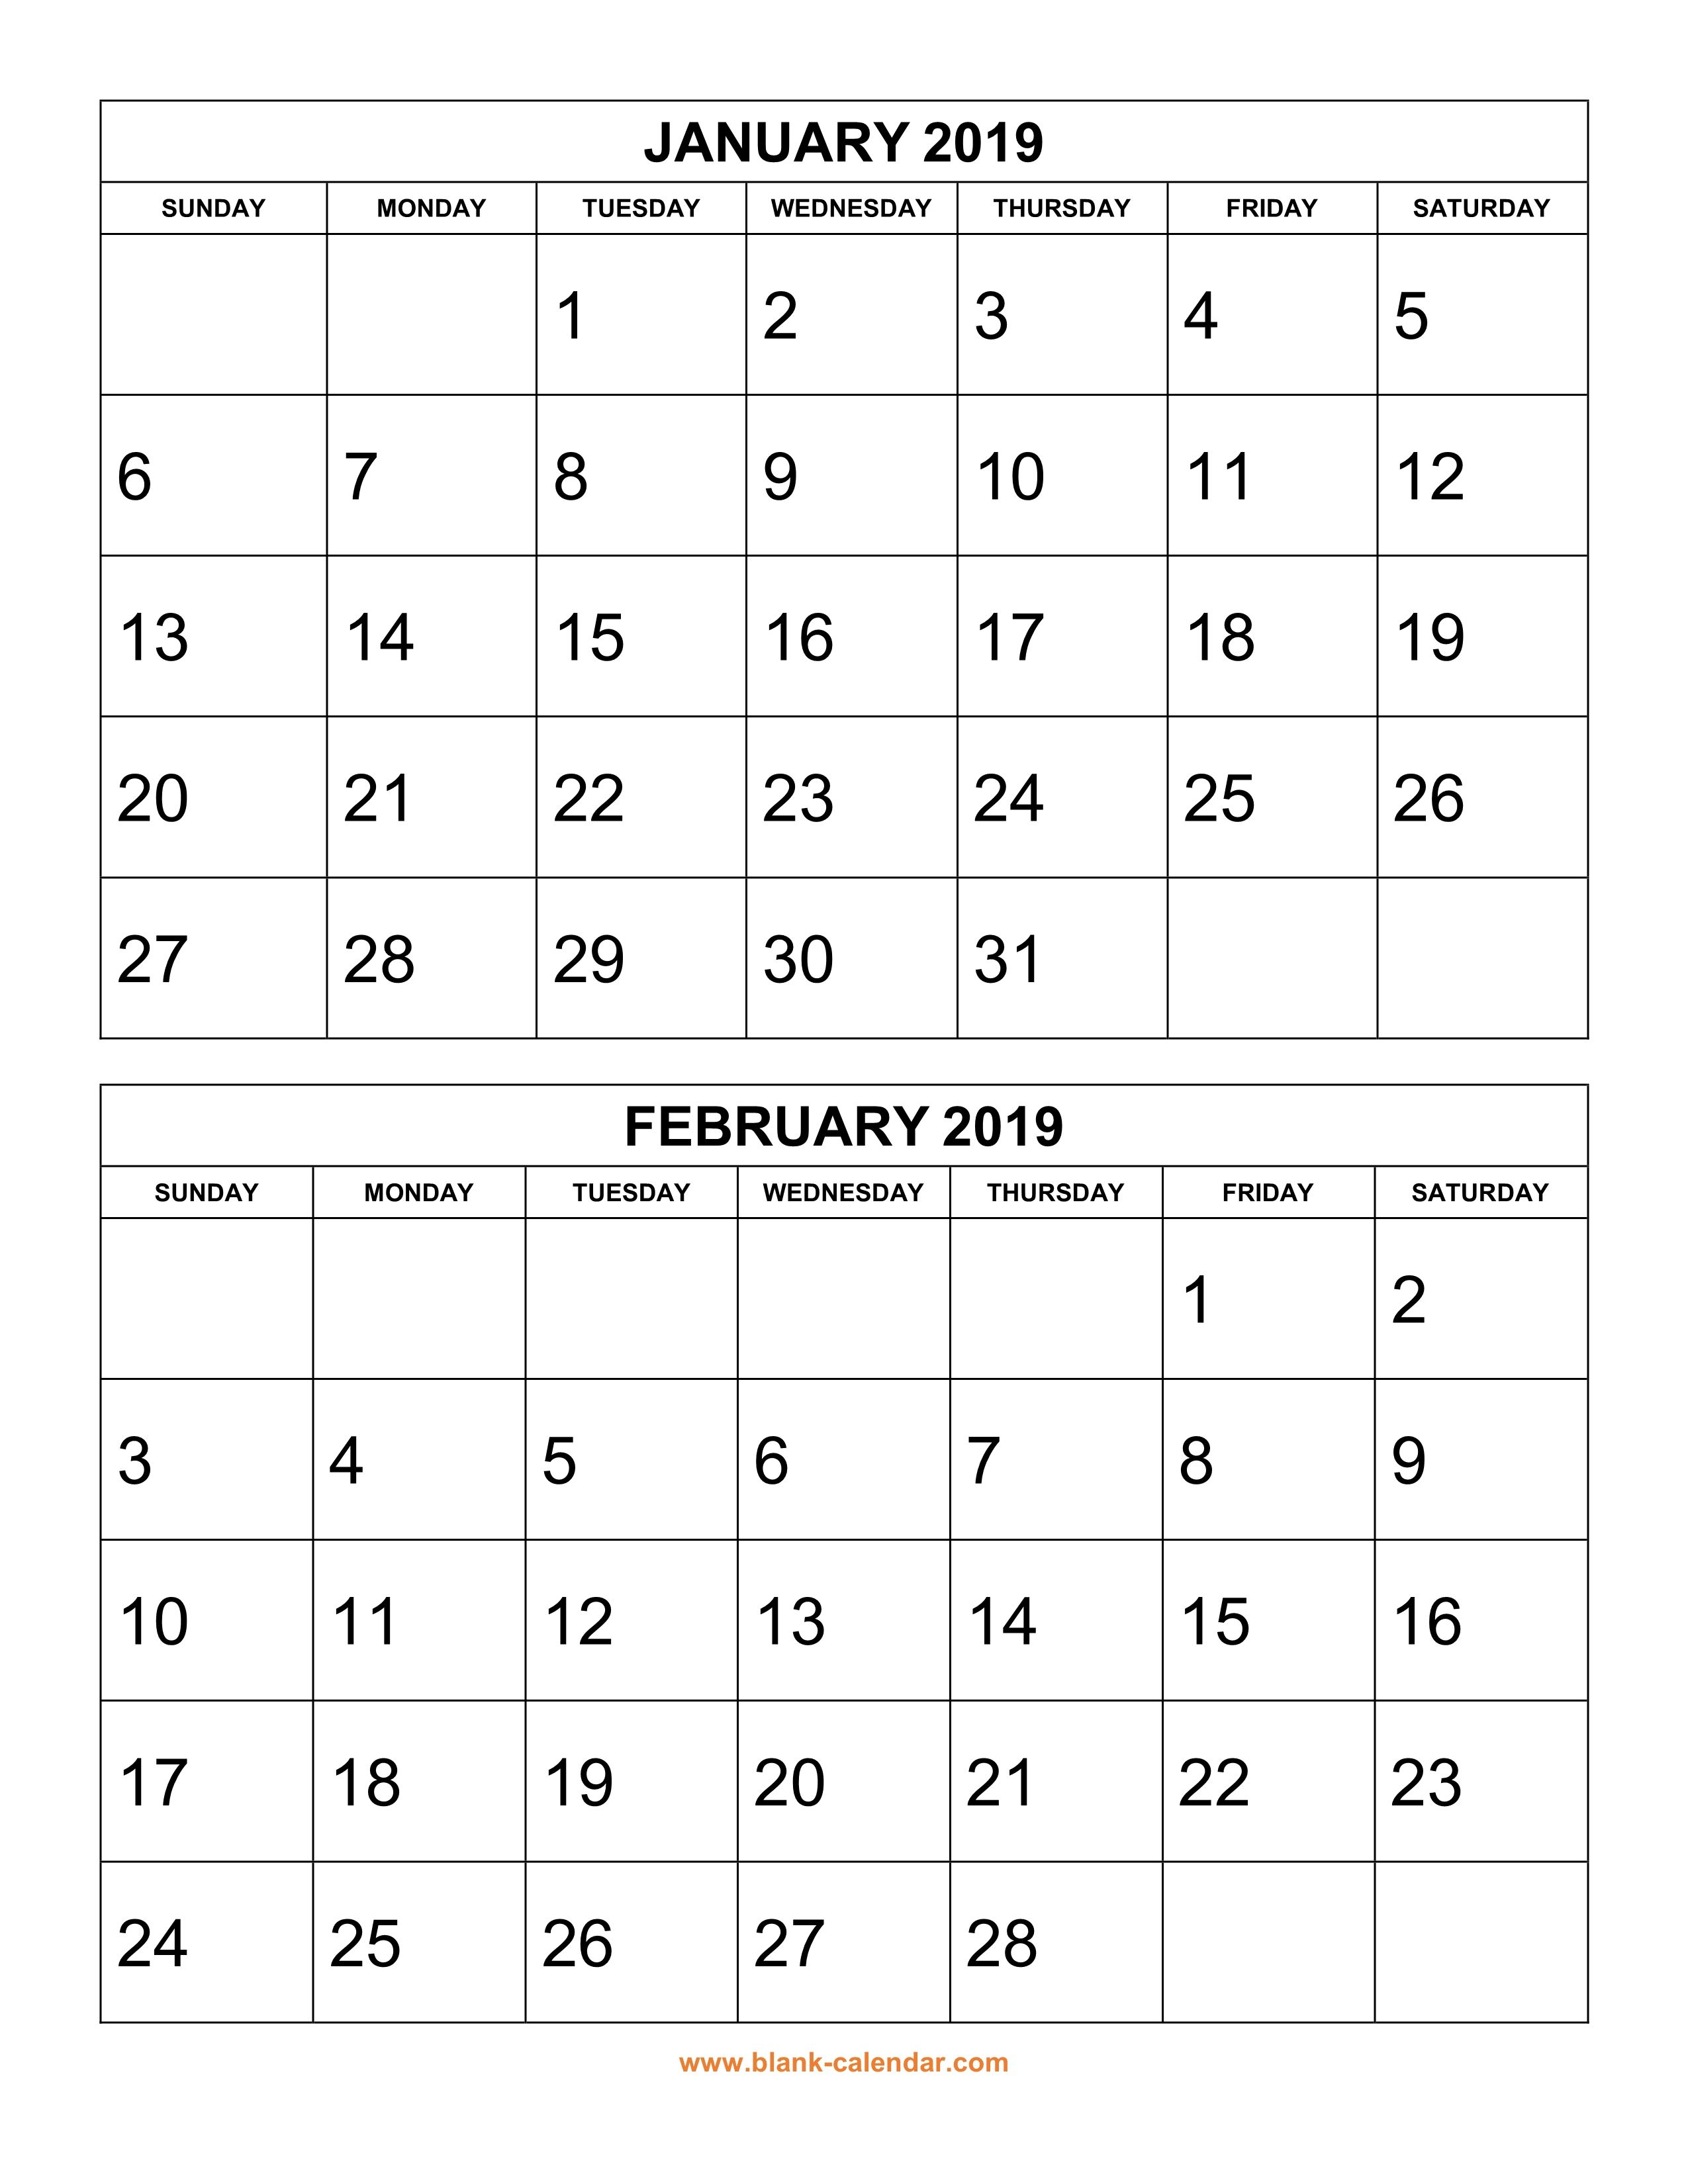 Pinjamie Hanks On Preschool | Blank Monthly Calendar